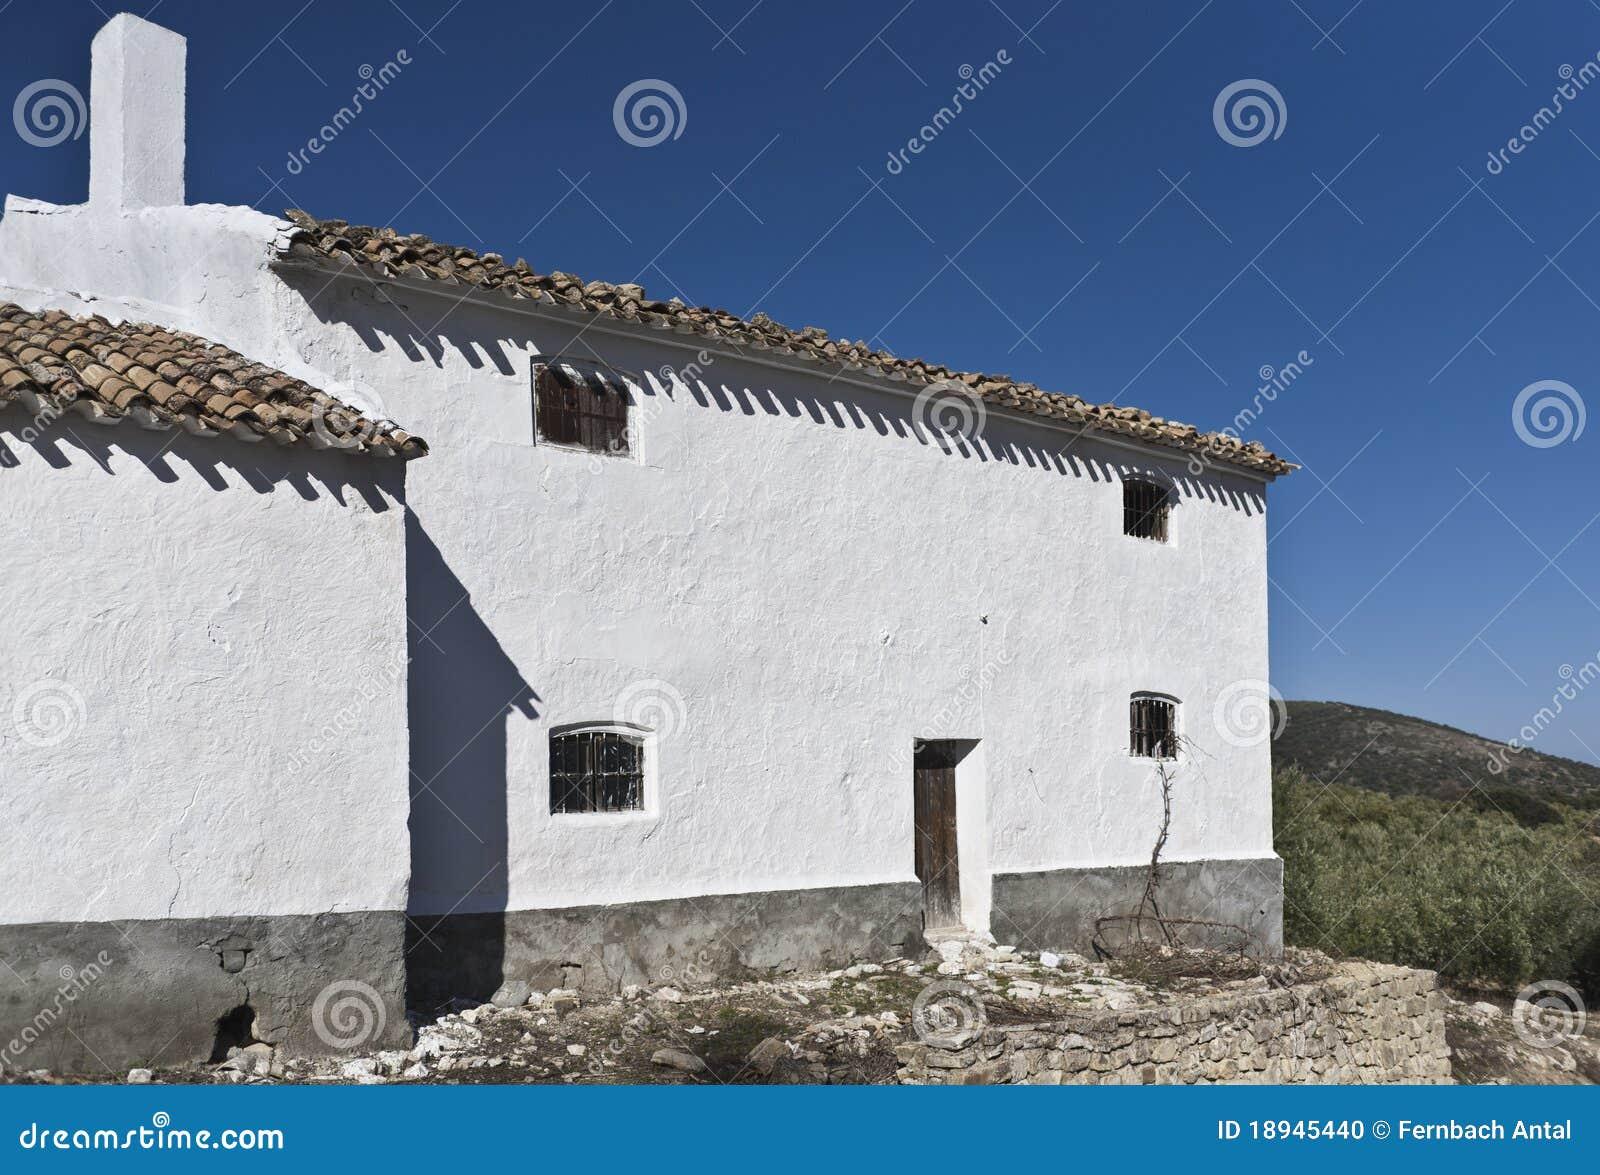 Oil press house in Spain